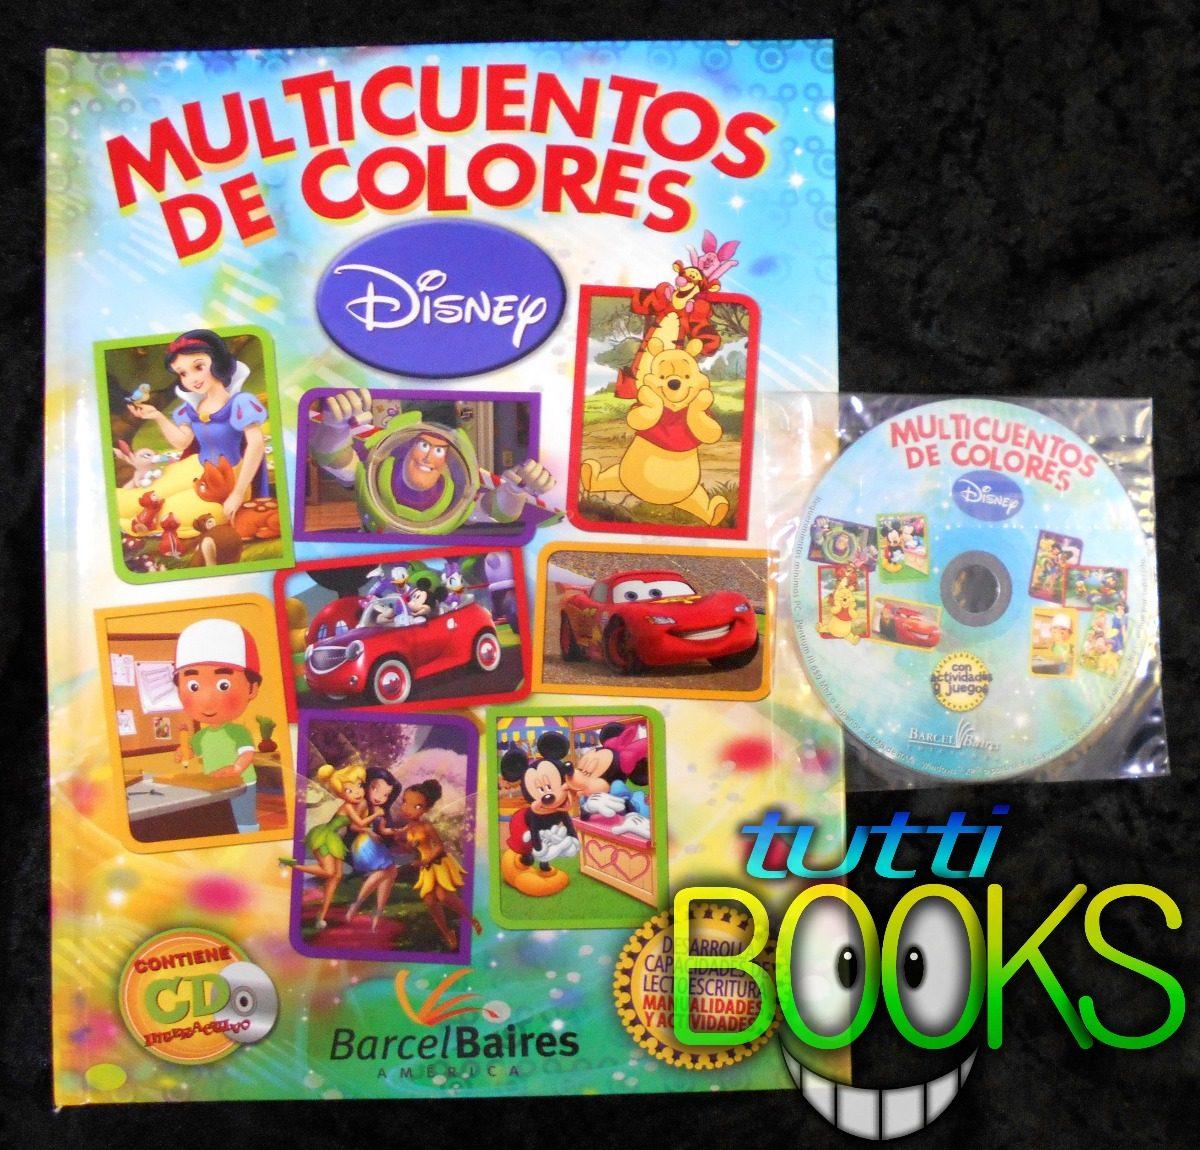 Vistoso Titánico Libro Para Colorear Ilustración - Dibujos Para ...